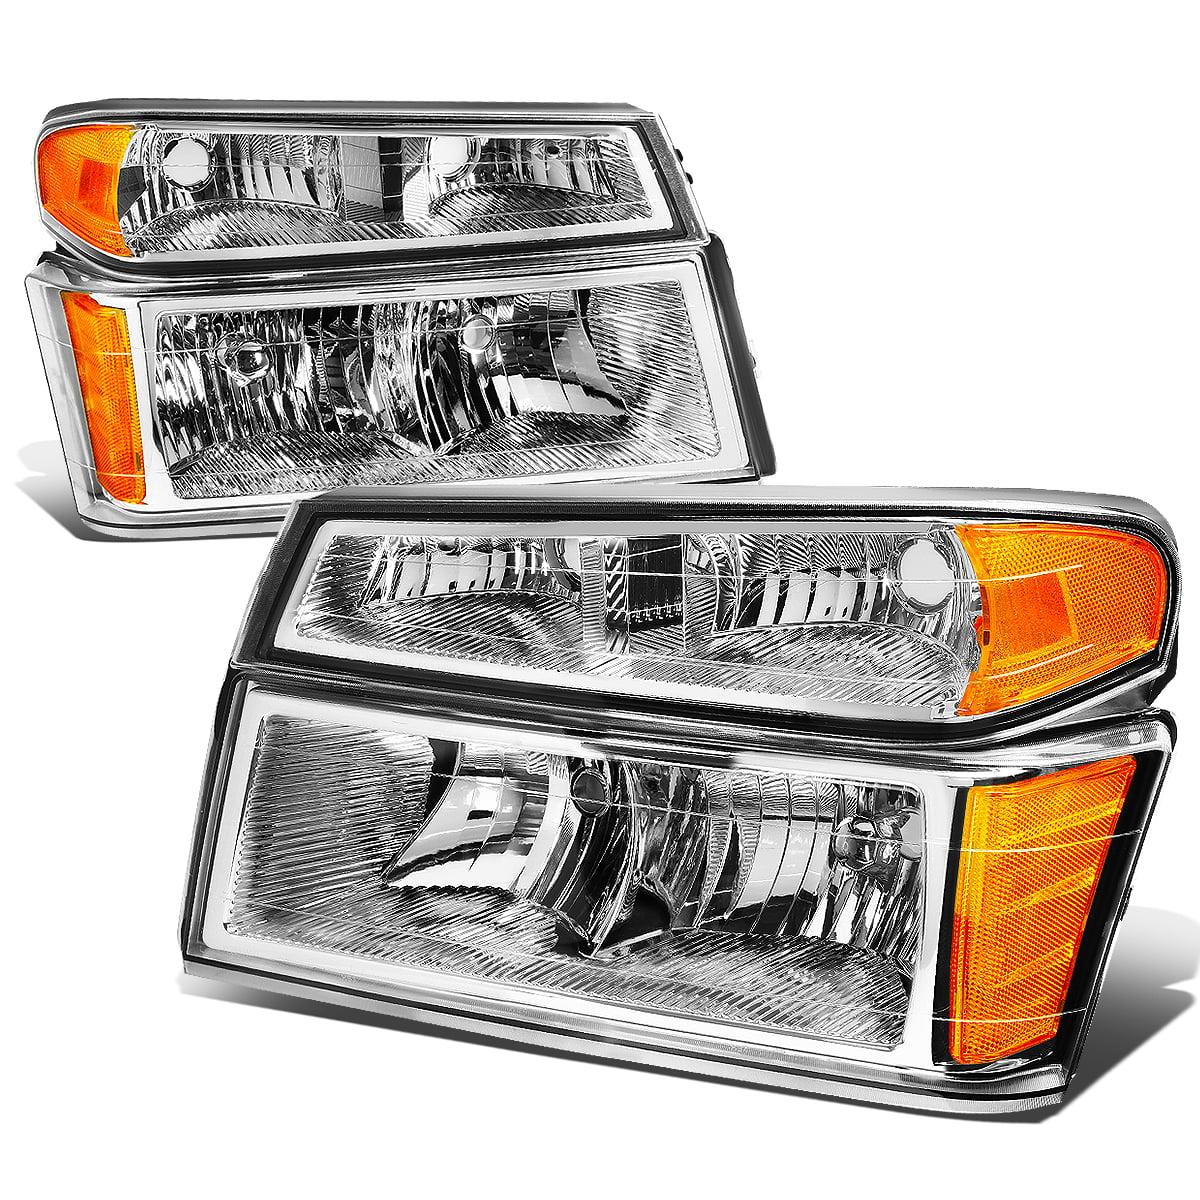 For 04-12 Chevy Colorado/GMC Canyon / Isuzu i280 i290 i350 4Pcs Headlight + Bumper Lamp Chrome Housing Amber Corner 05 06 07 08 09 10 11